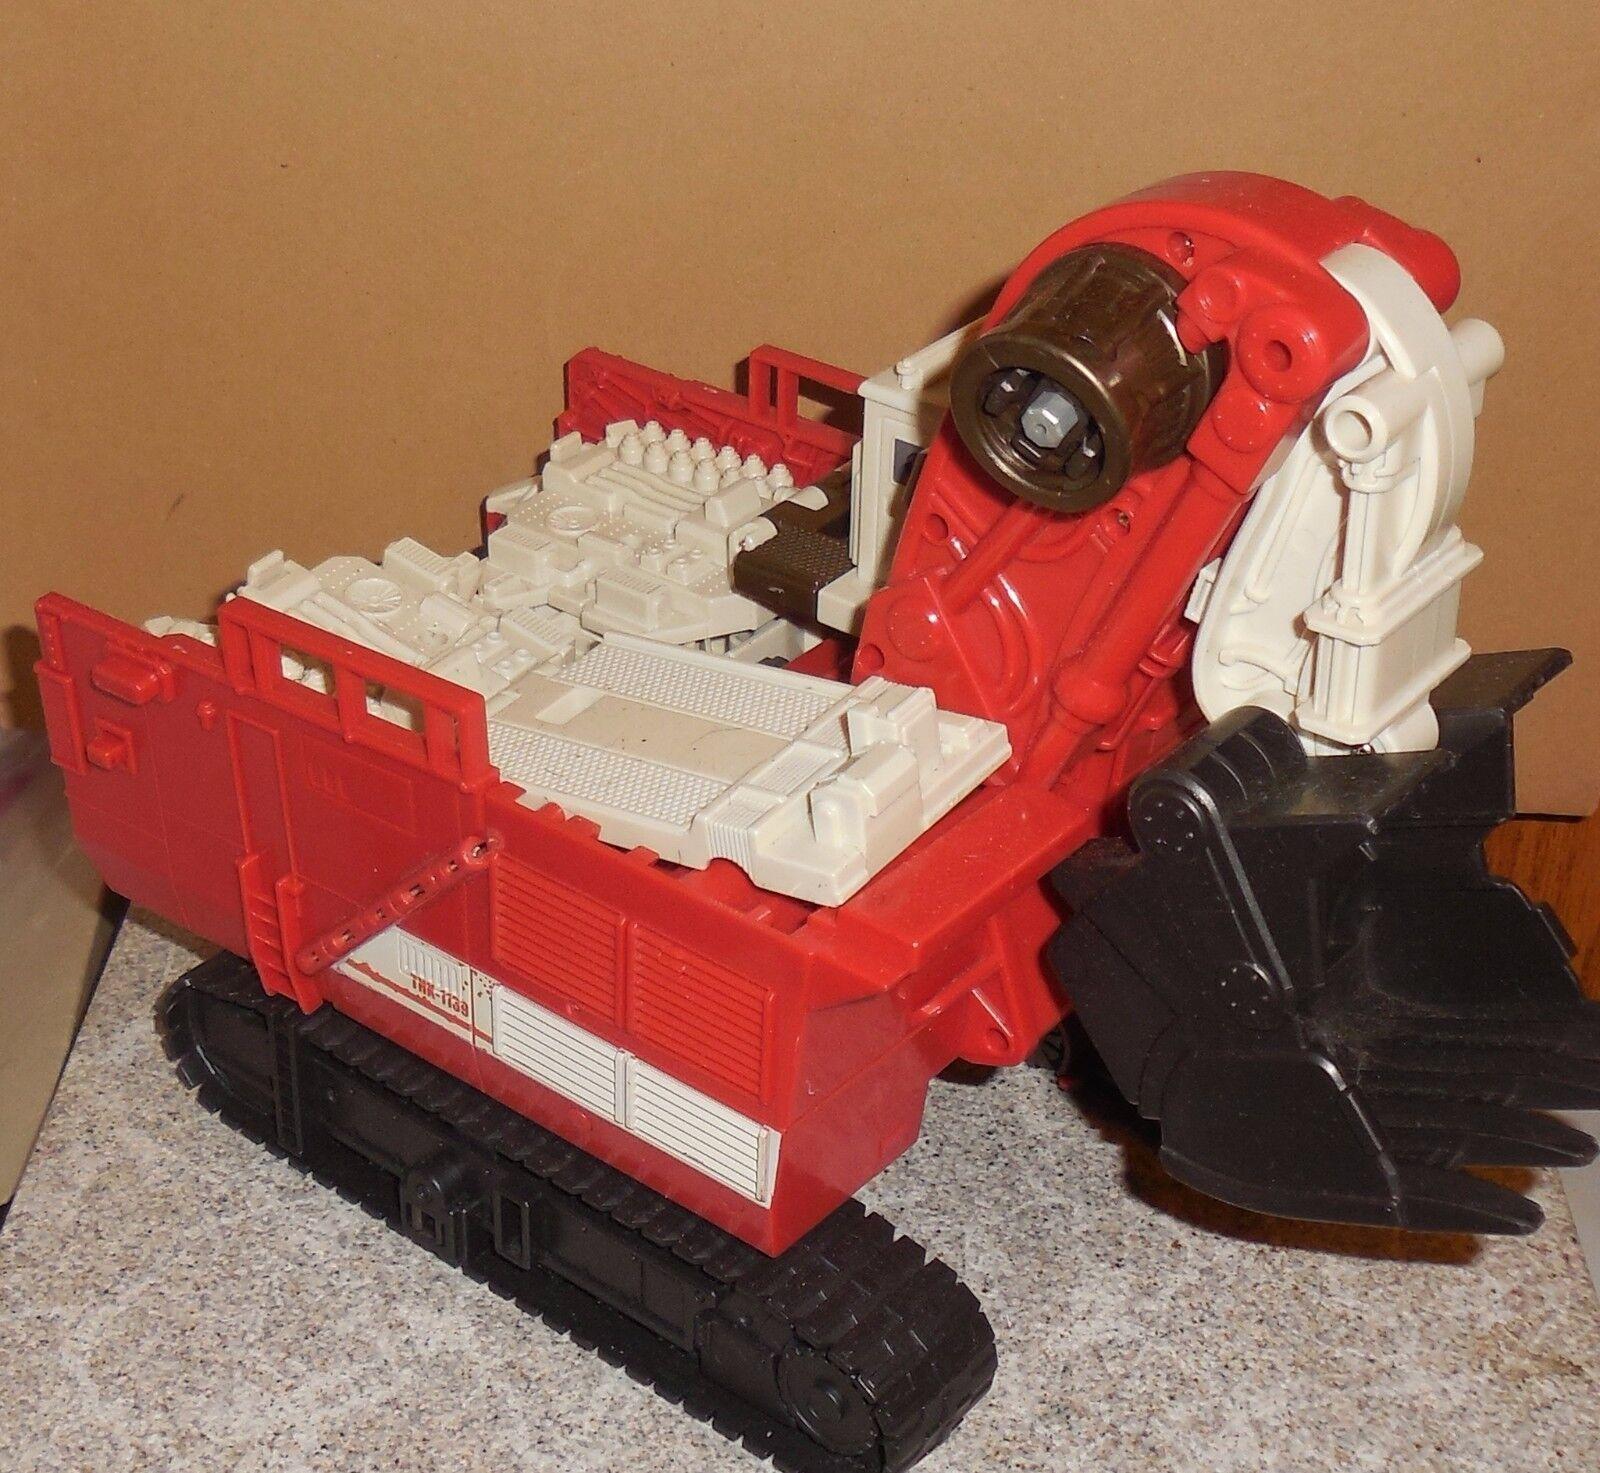 Transformers redf  SCAVENGER Supreme Demolishor Devastator Figure